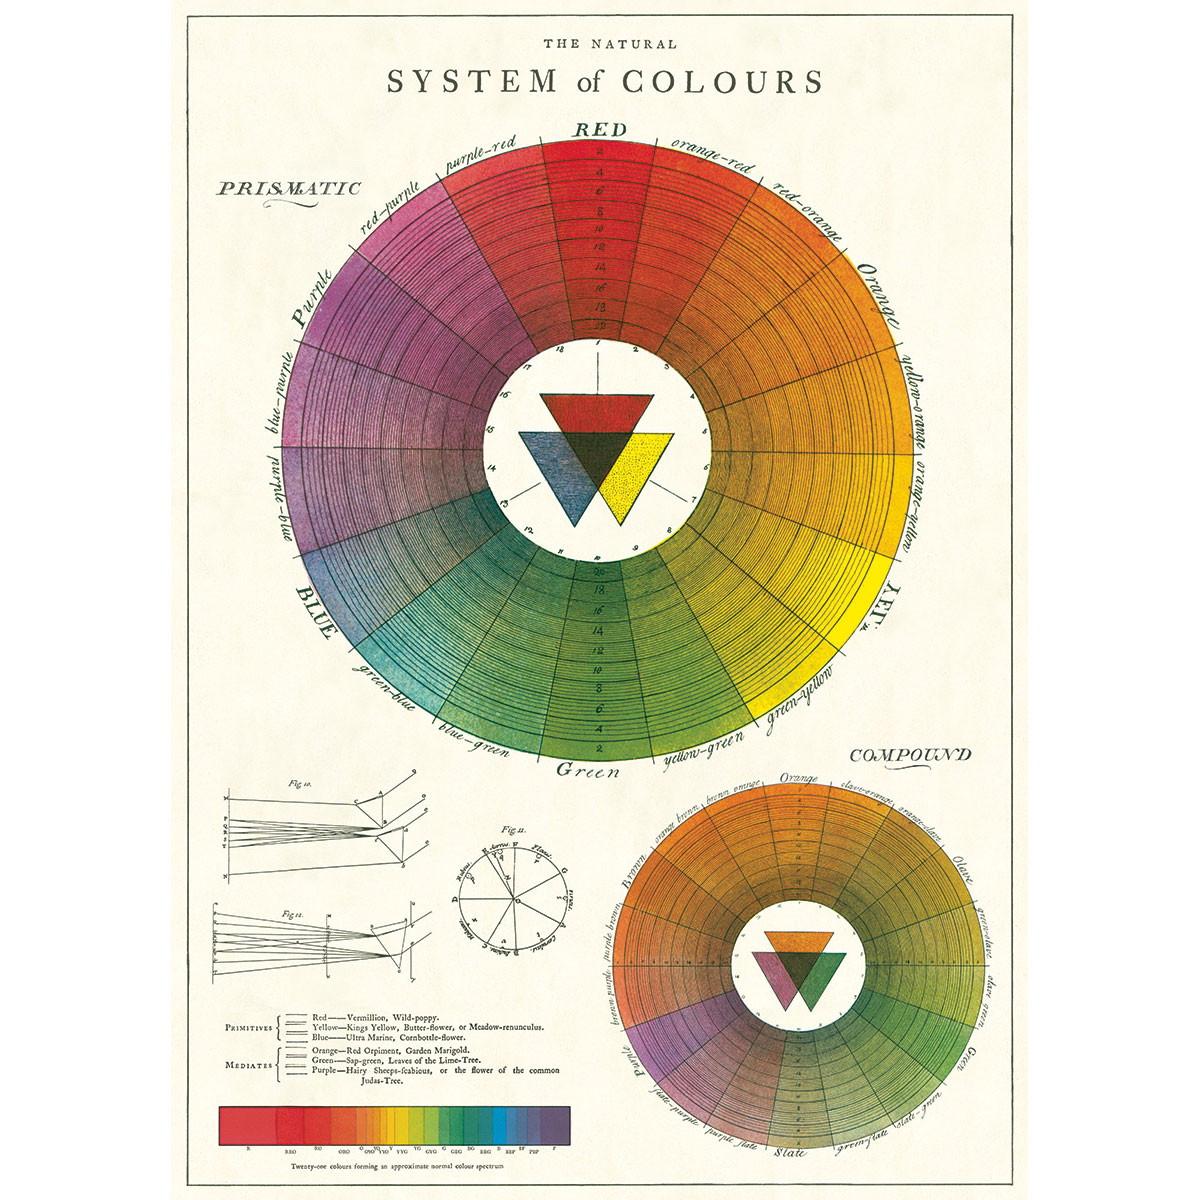 Color Wheel Chart Artist Vintage Style Classroom Poster Ephemera | eBay